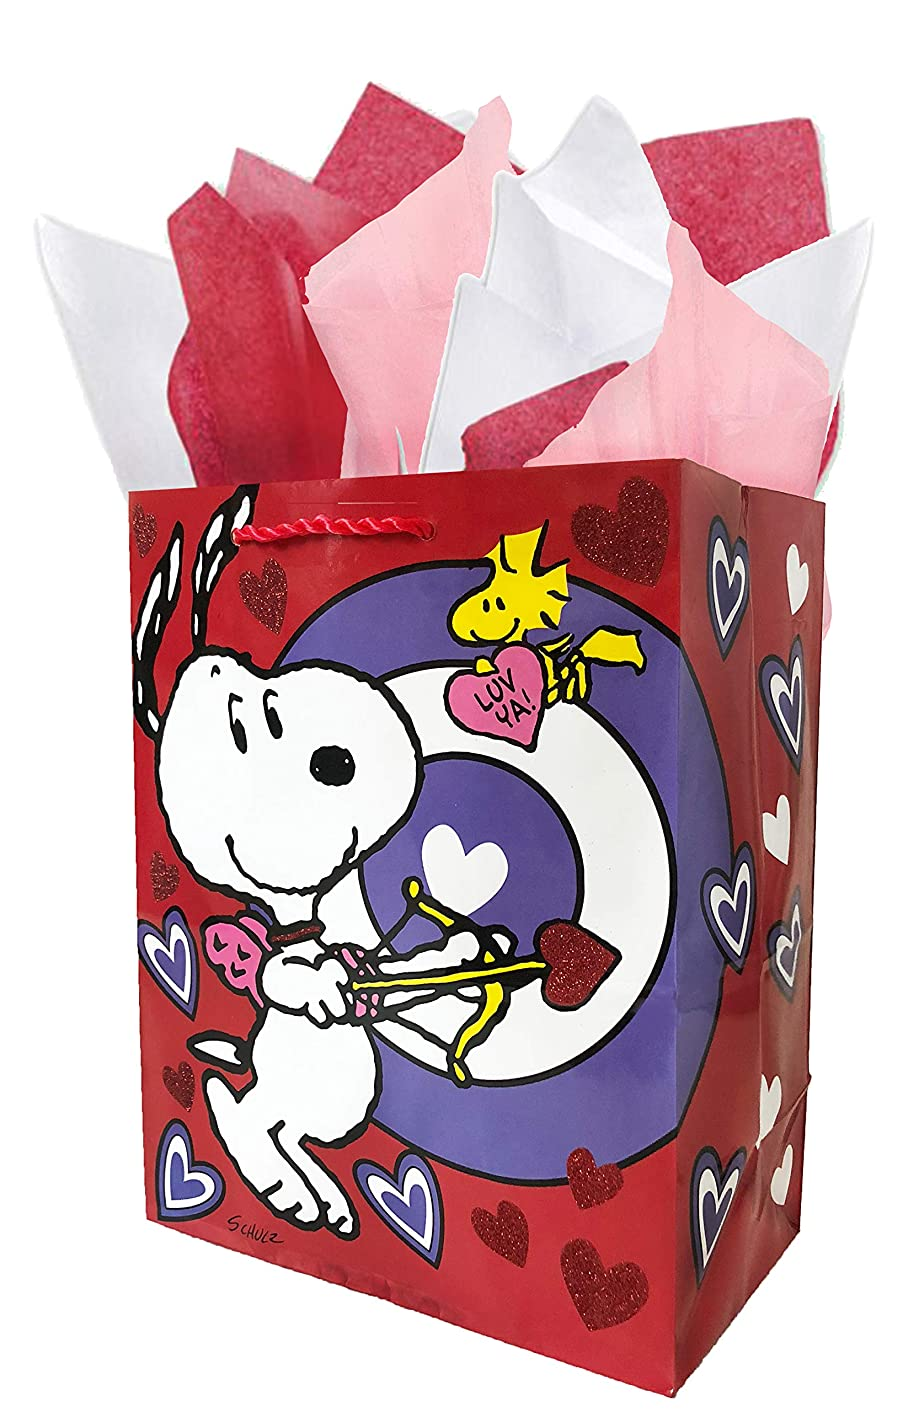 Red Glitter Heart Valentine Peanuts Gang Gift Bag & Tissue Paper Set - Cupid Snoopy & Woodstock - Small/Medium